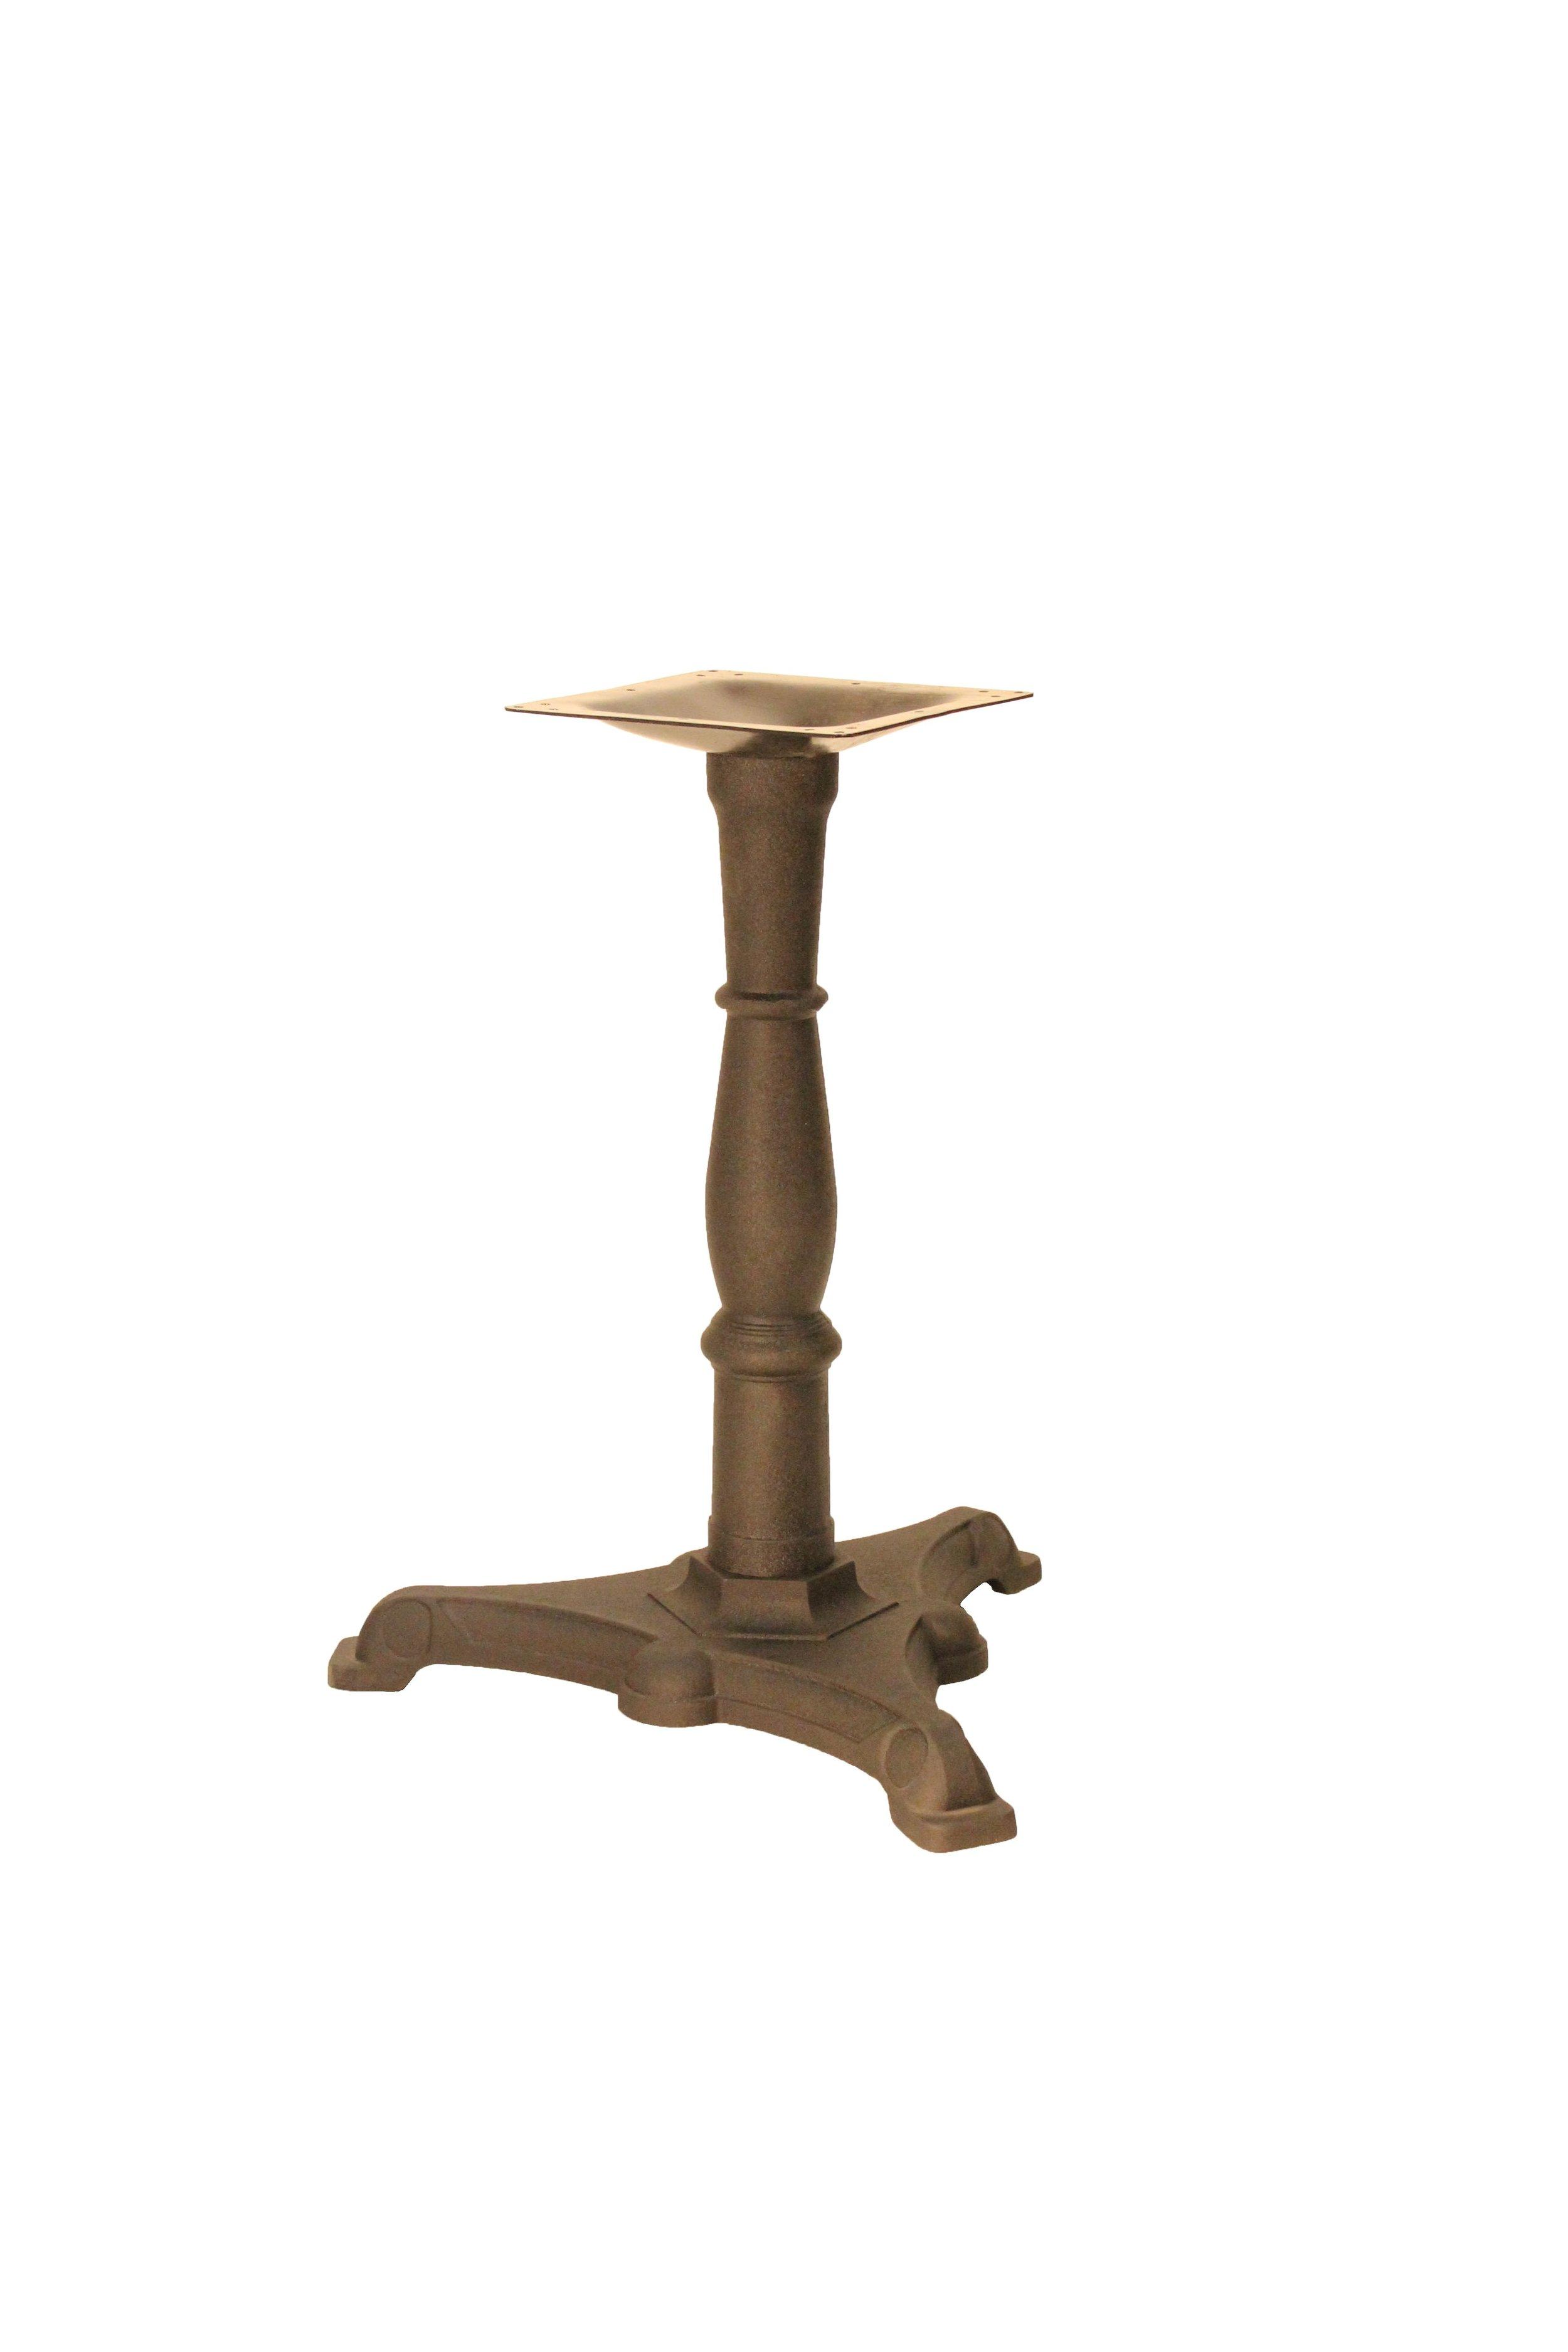 B15LH - Cast Iron Table Base/ Steel Column